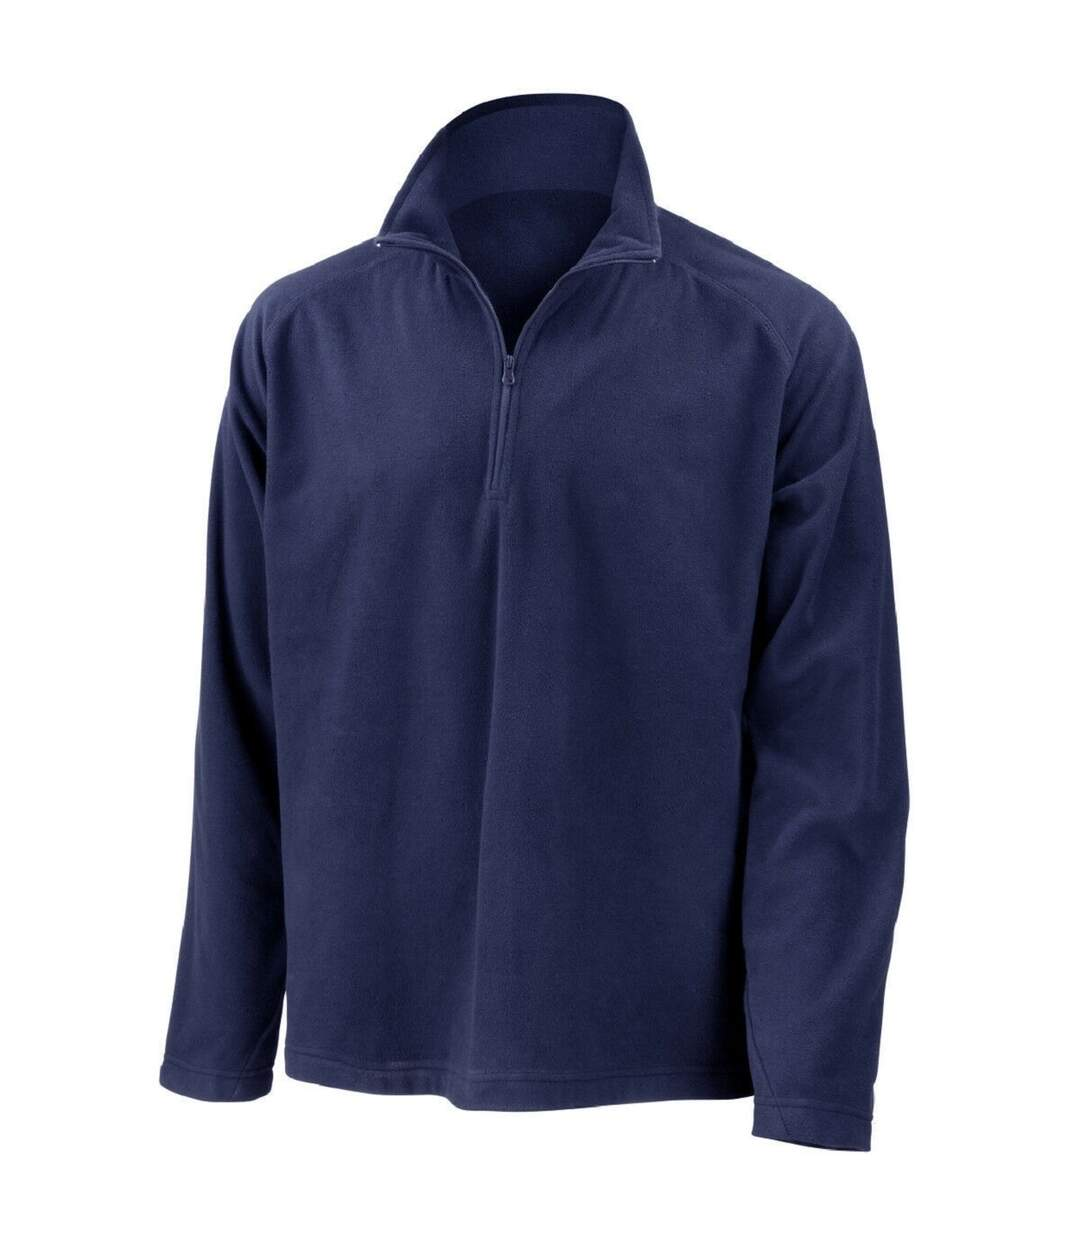 Result Mens Core Micron Anti-Pill Fleece Top (Navy Blue) - UTBC849